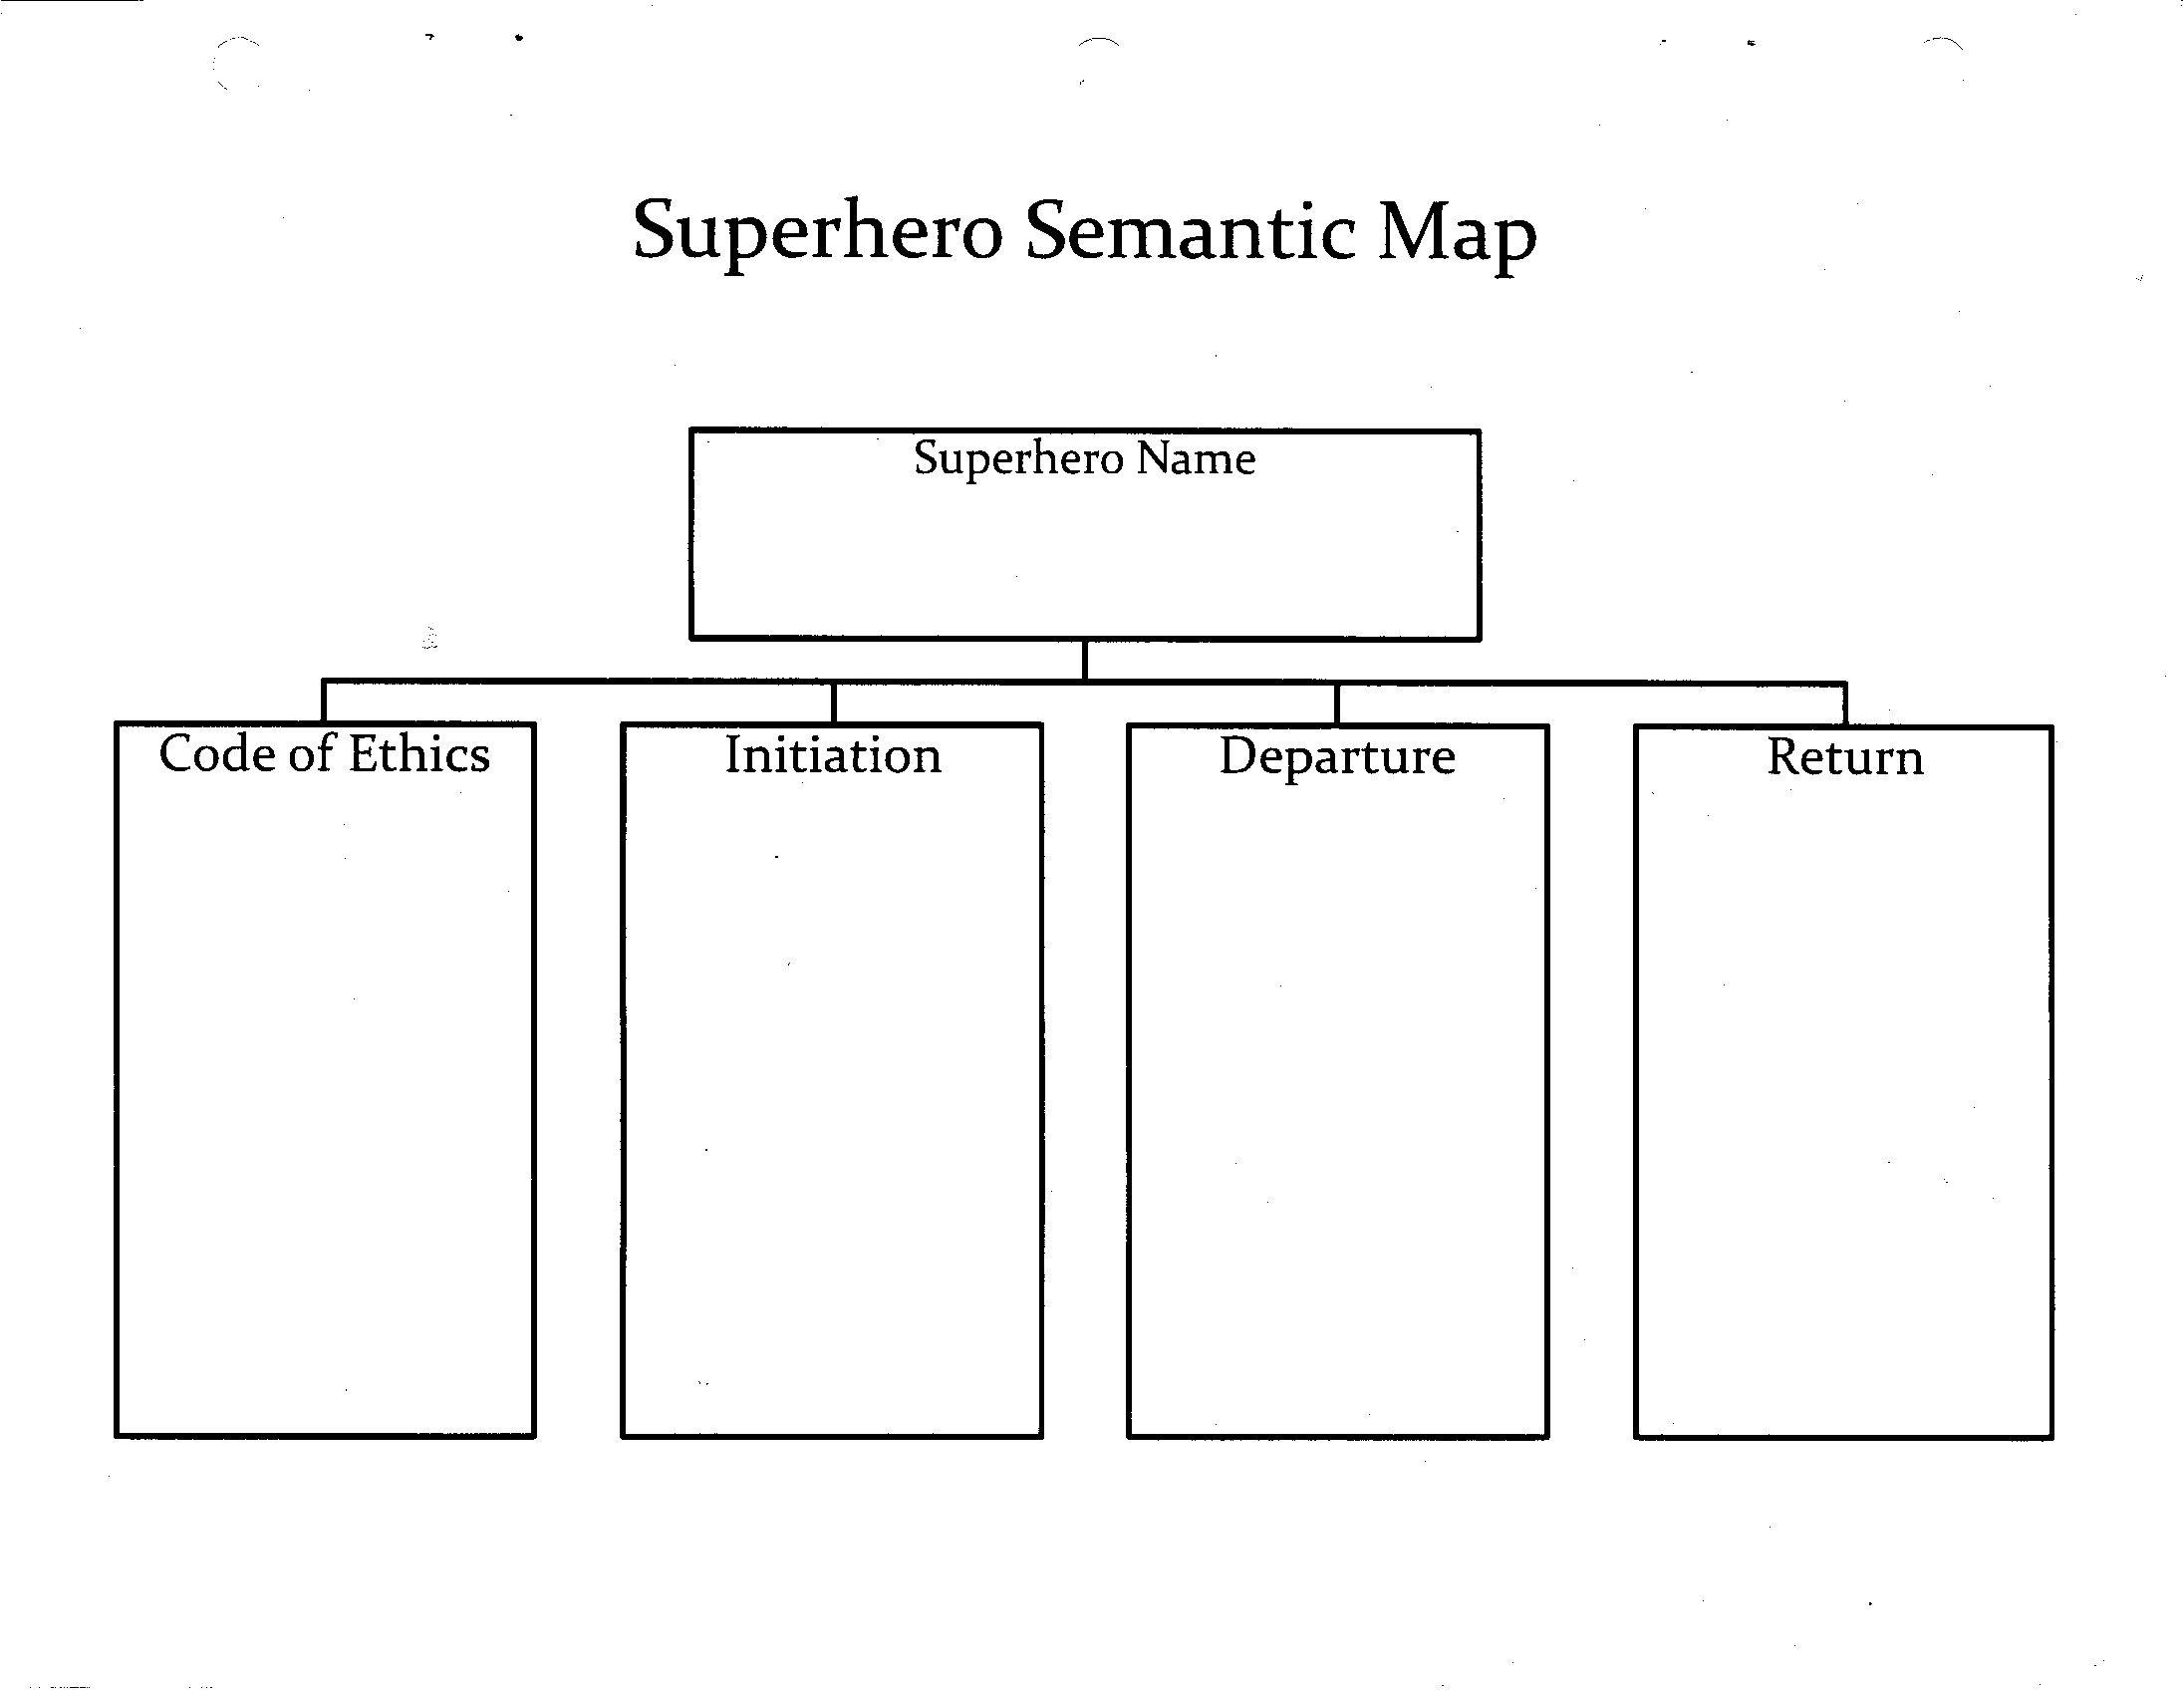 semantic map template - super hero semantics map art education foundation rachel